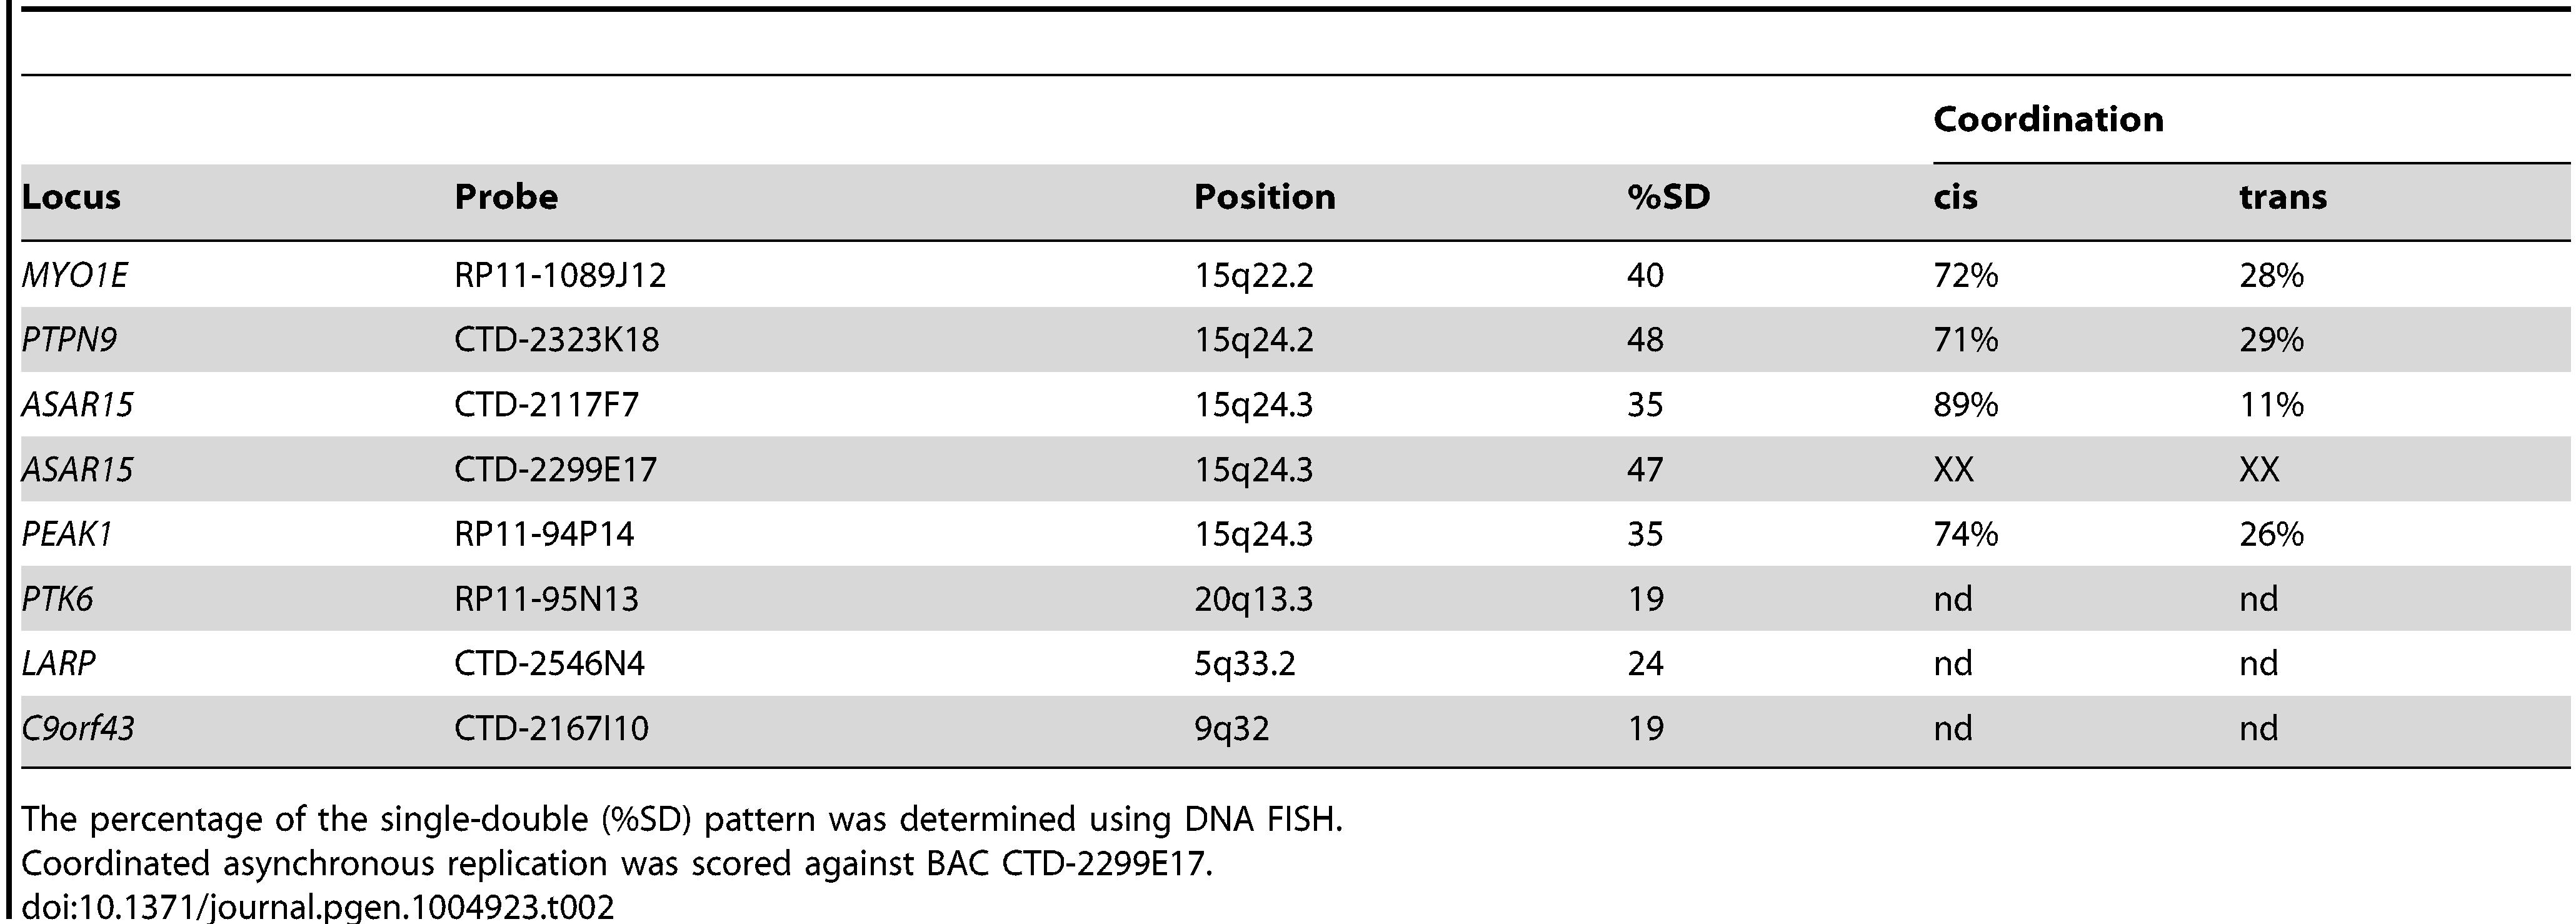 DNA FISH analysis of human loci.